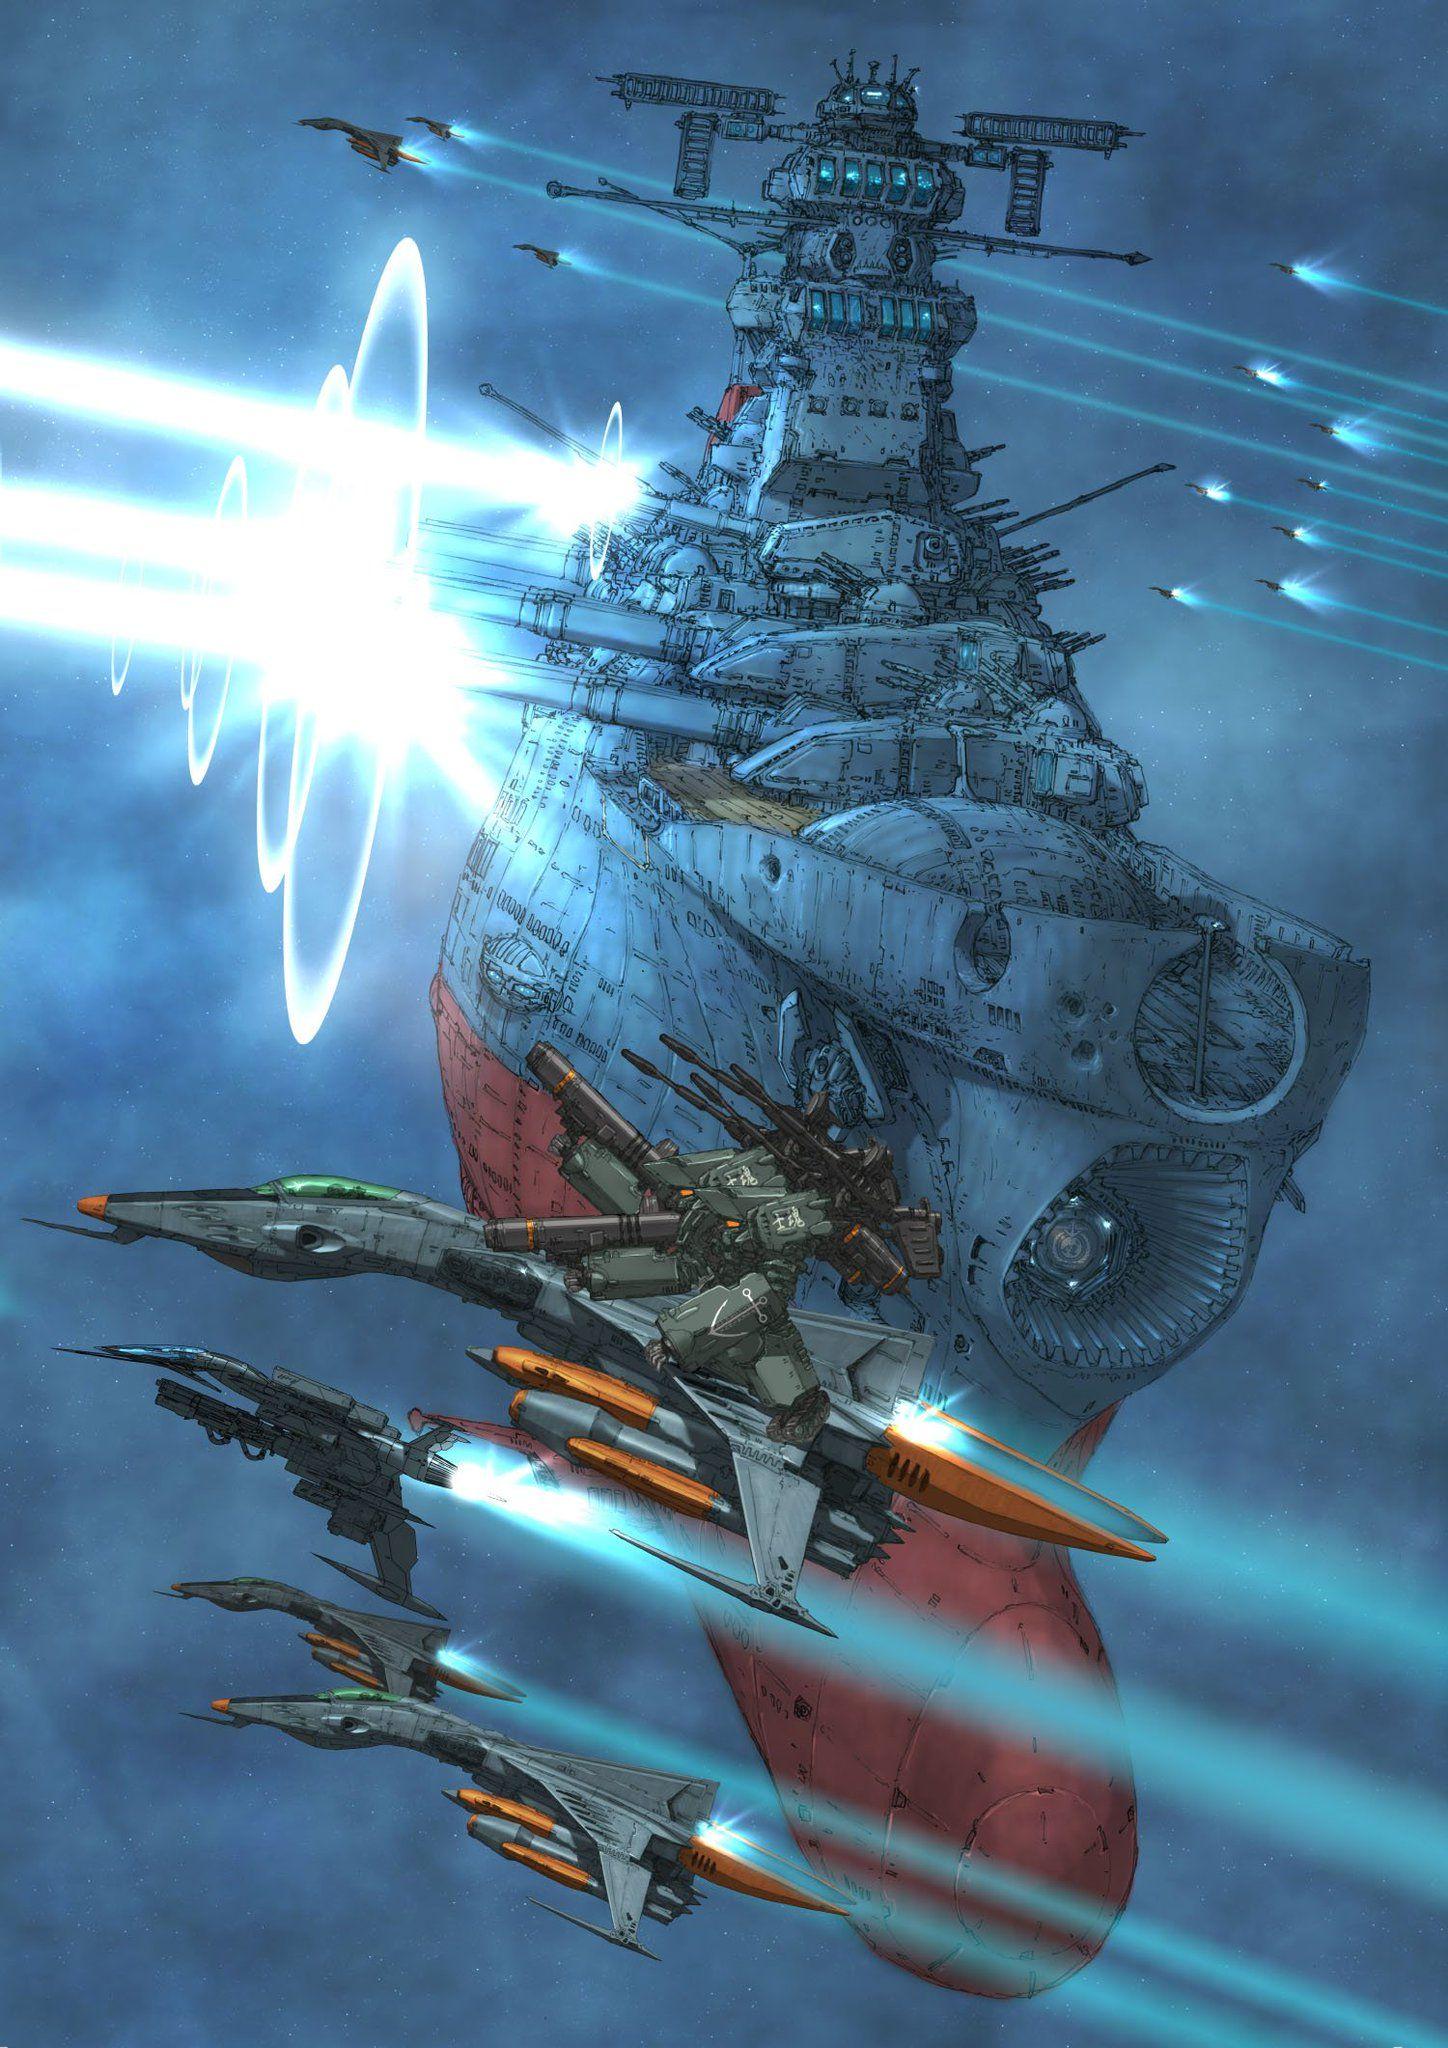 Pin By Matt On Anime Manga Spaceship Art Space Battleship